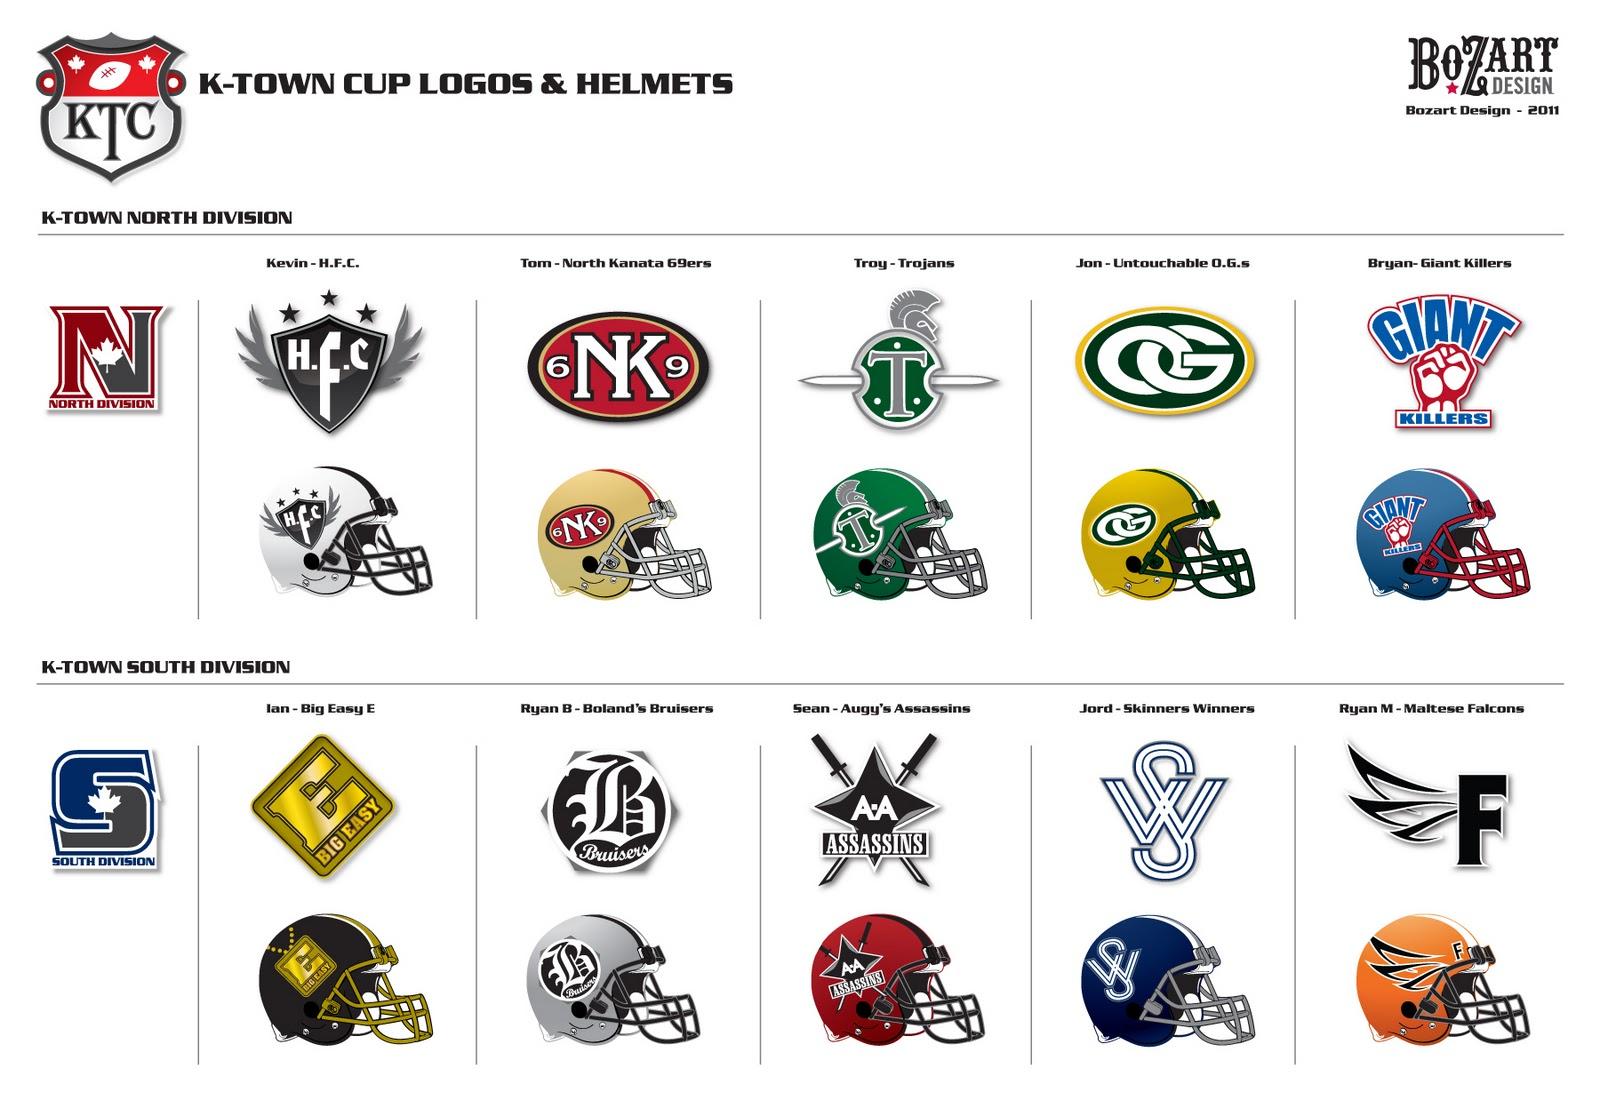 Awesome fantasy football team logos